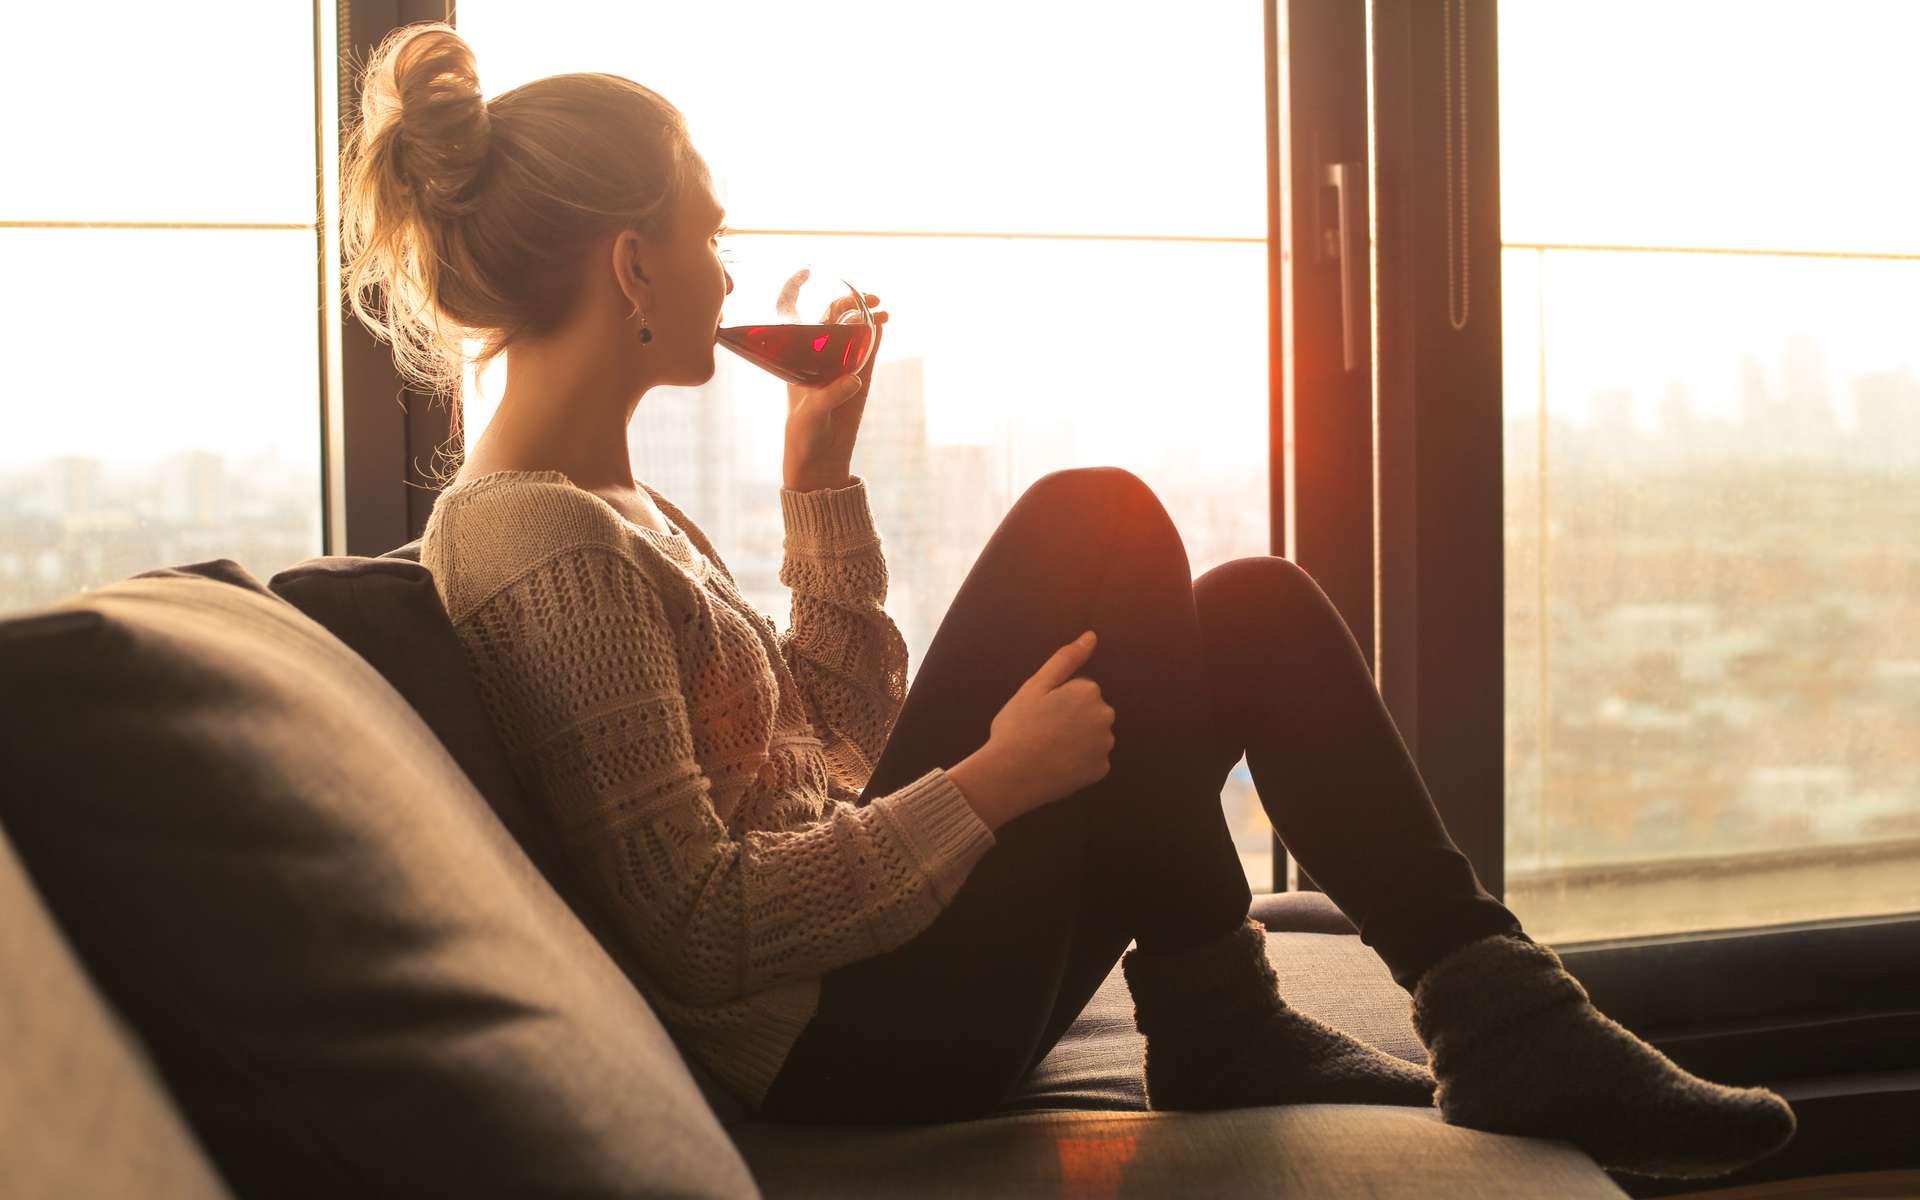 Quand devient-on alcoolique ? © merla, Adobe Stock